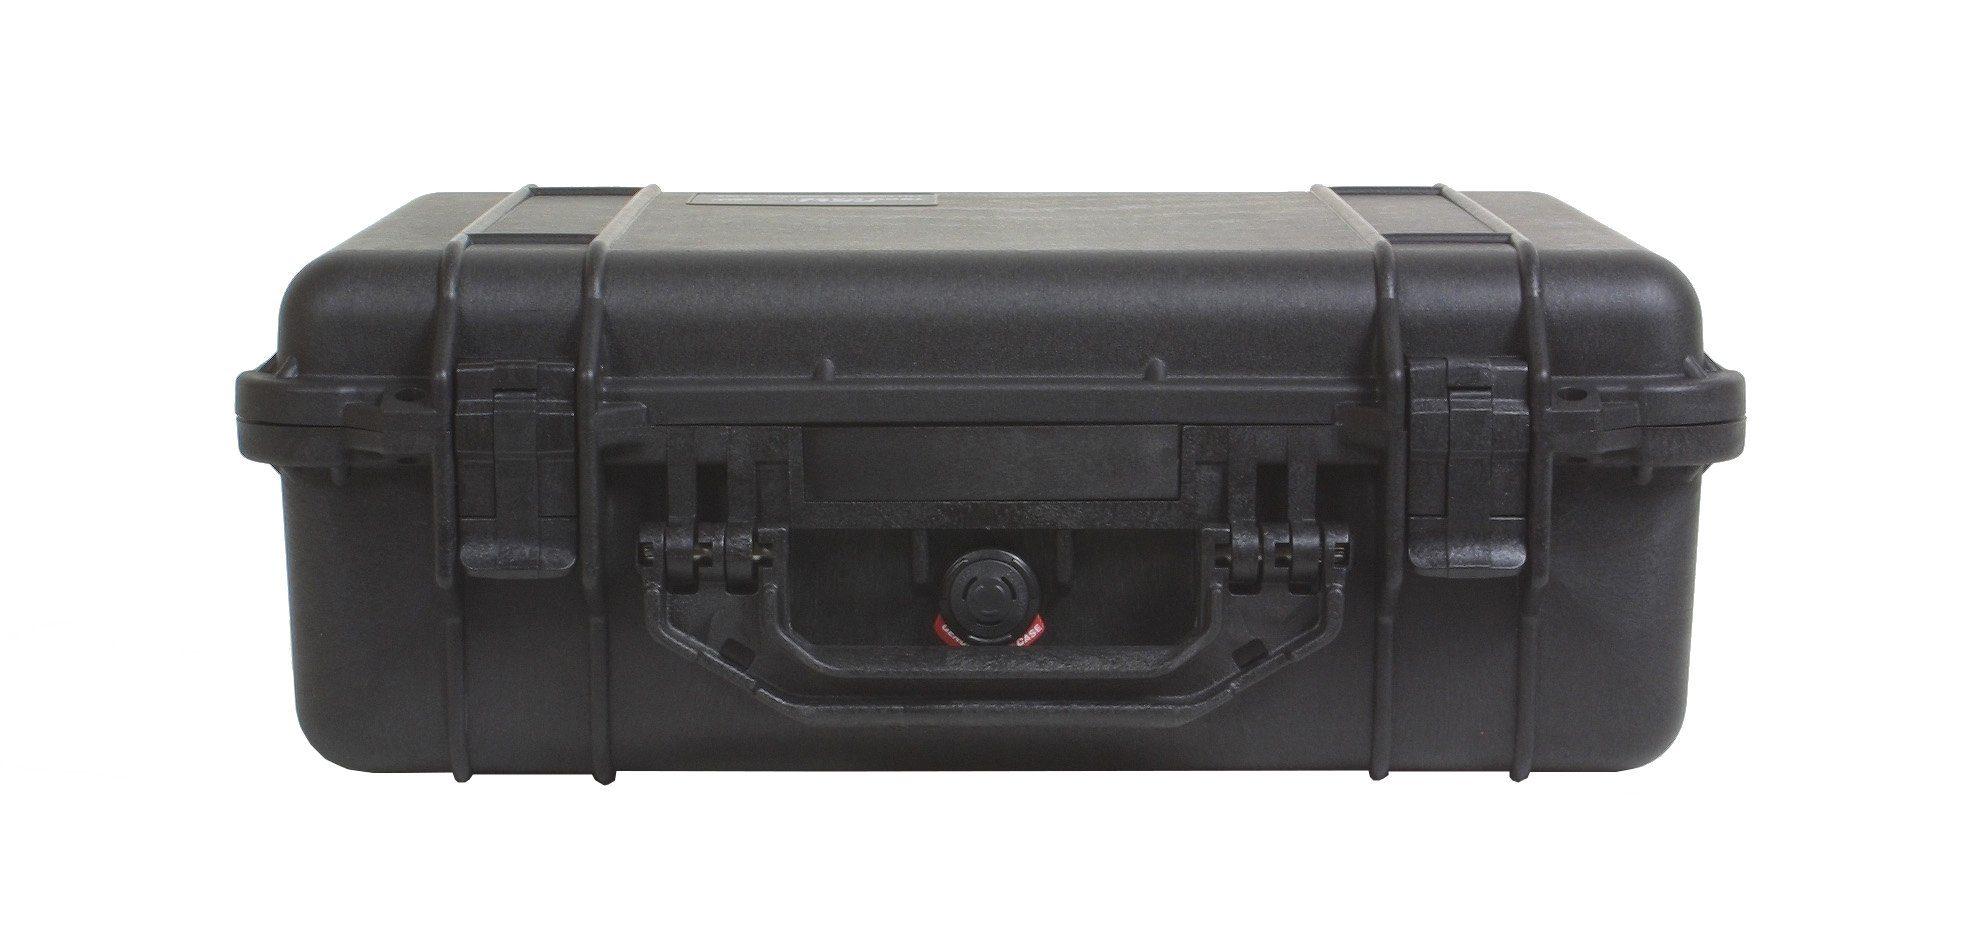 Peli Campingtruhe & -Kiste »box 1500 ohne Schaumeinsatz«